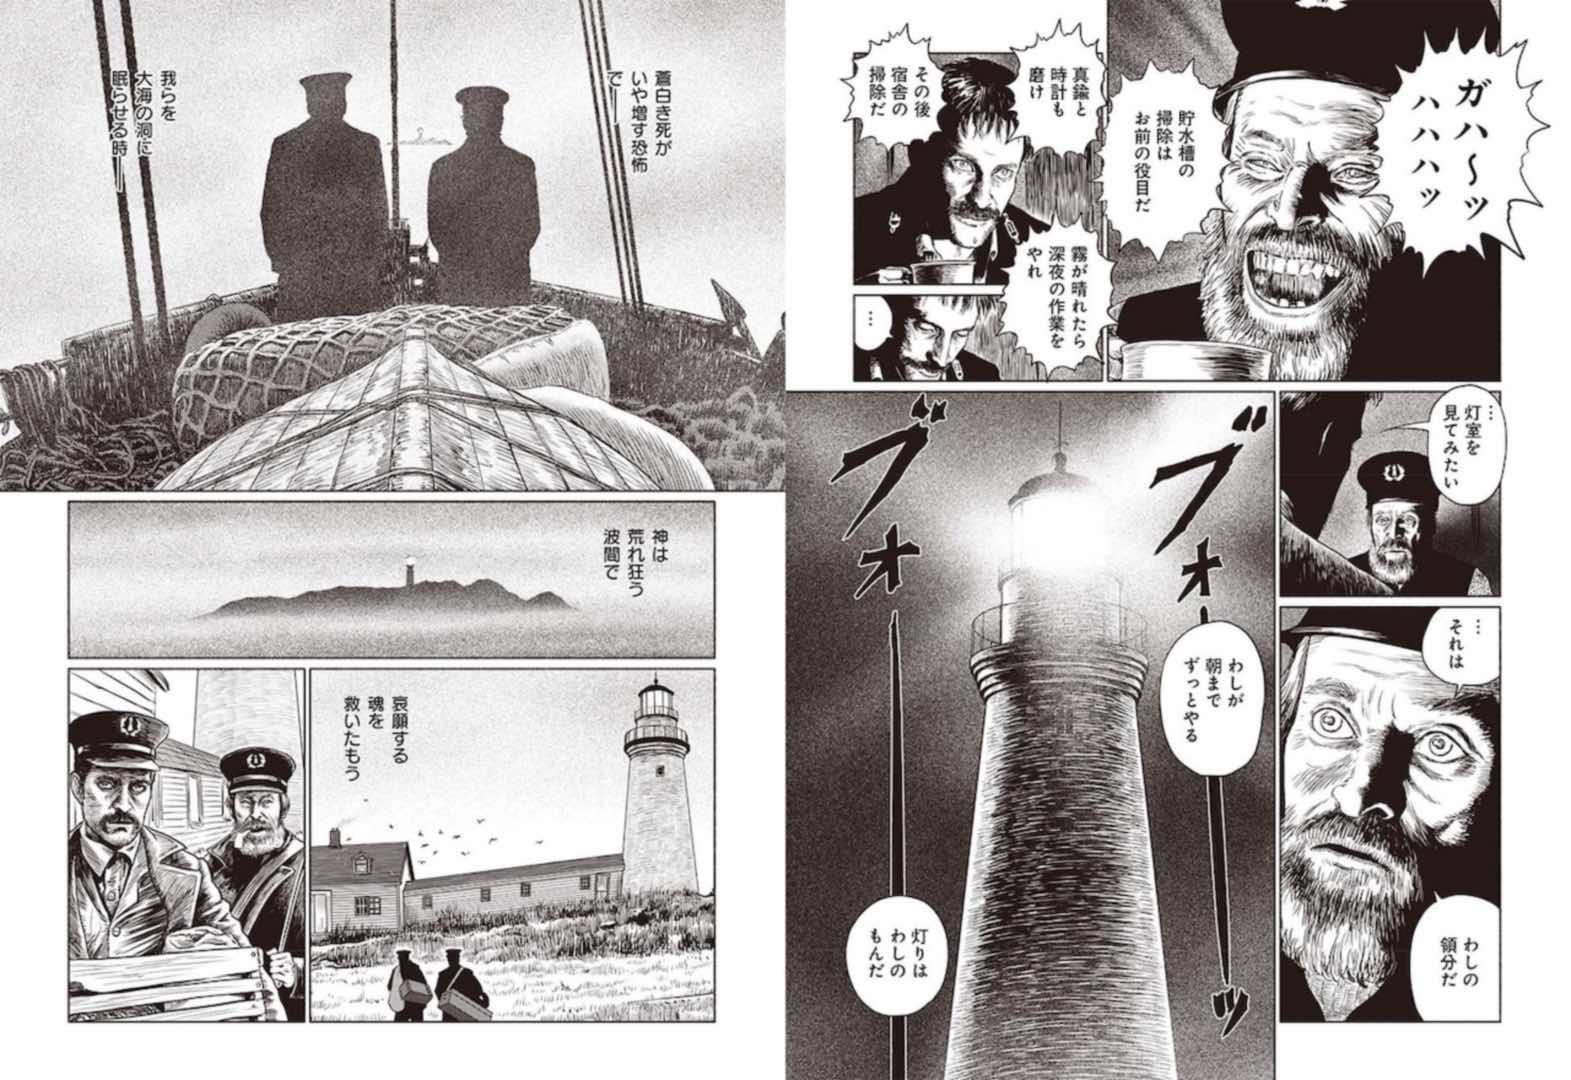 Junji Ito just made A24's 'The Lighthouse' into a manga 2